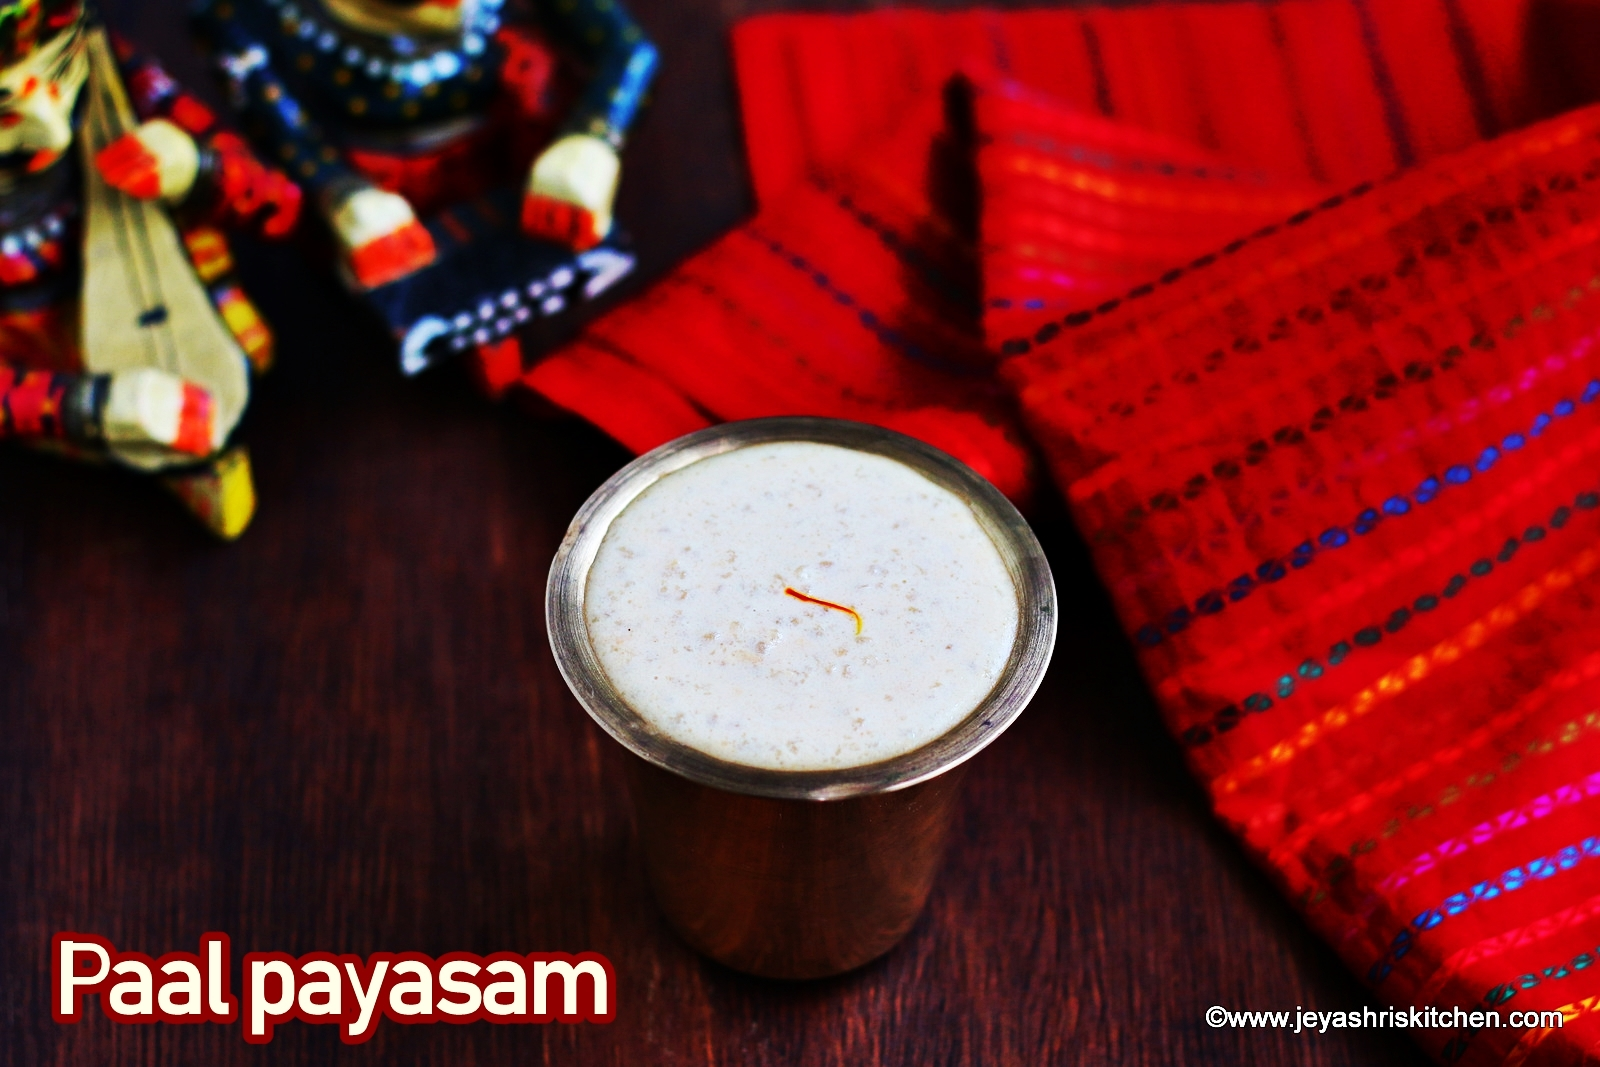 millet paal payasam recipe easy payasam recipes - Jeyashris Kitchen